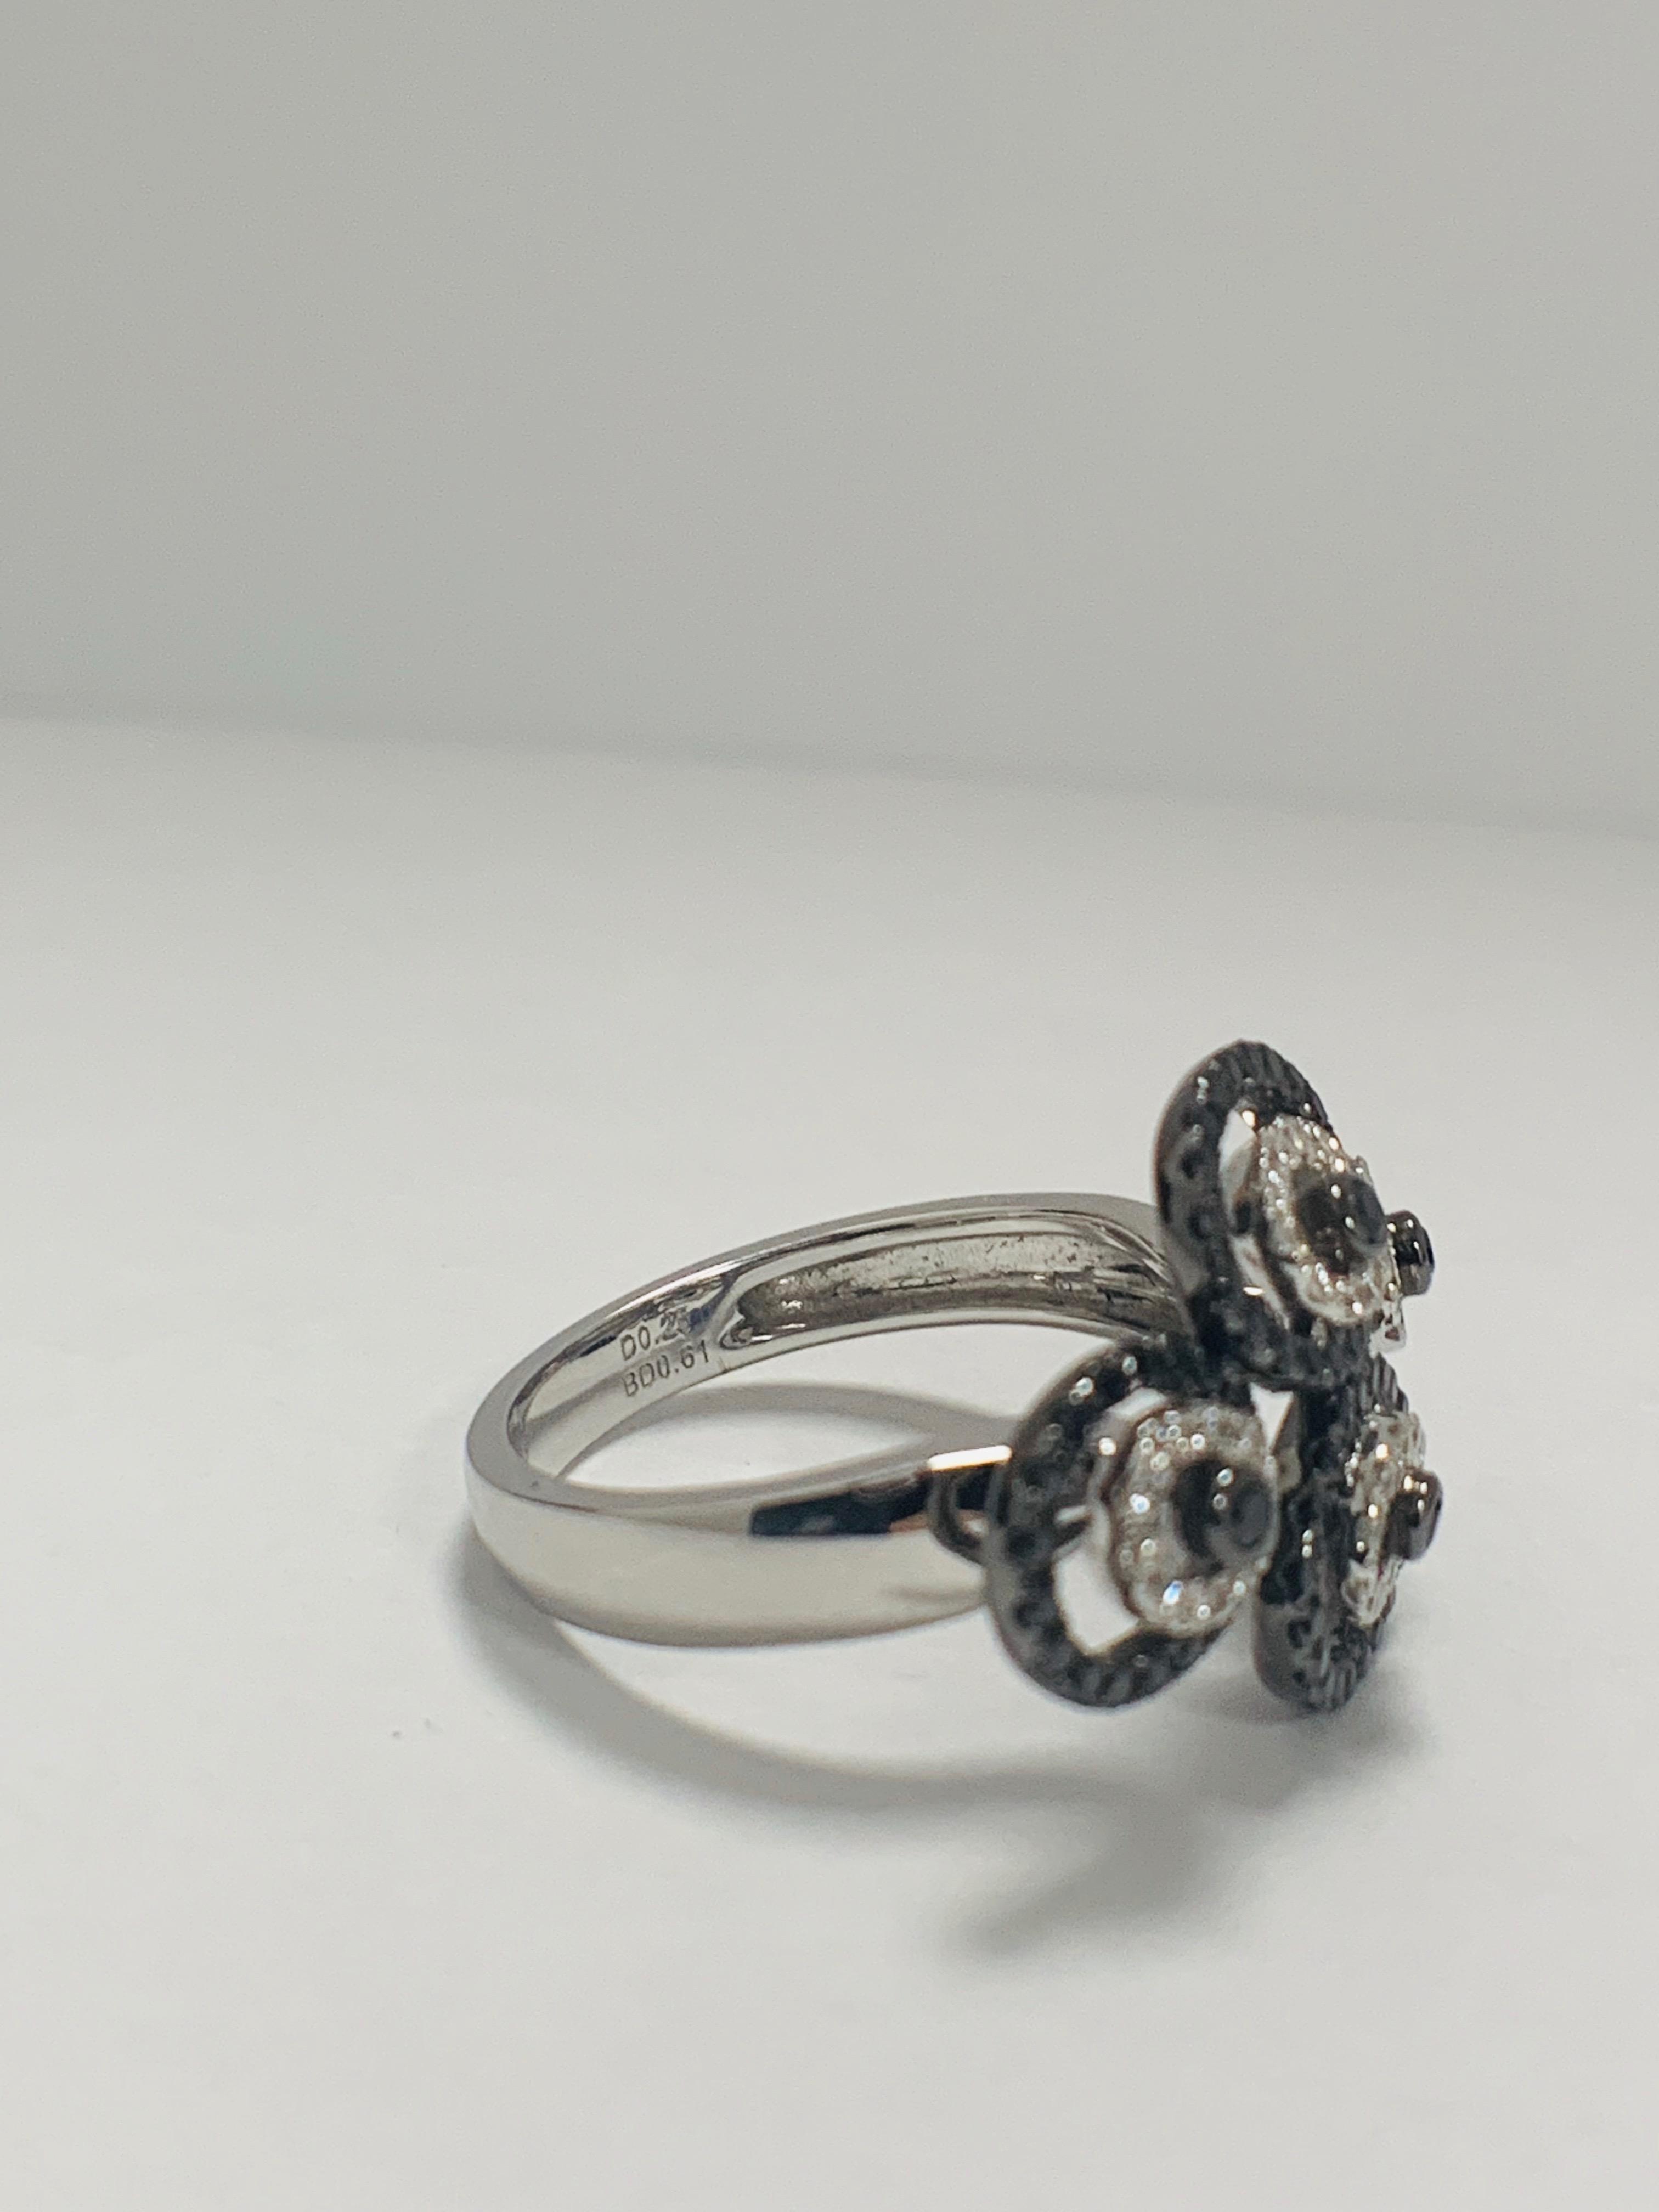 18ct White Gold Diamond ring featuring 80 round cut, black Diamonds (0.61ct TBDW) - Image 8 of 12